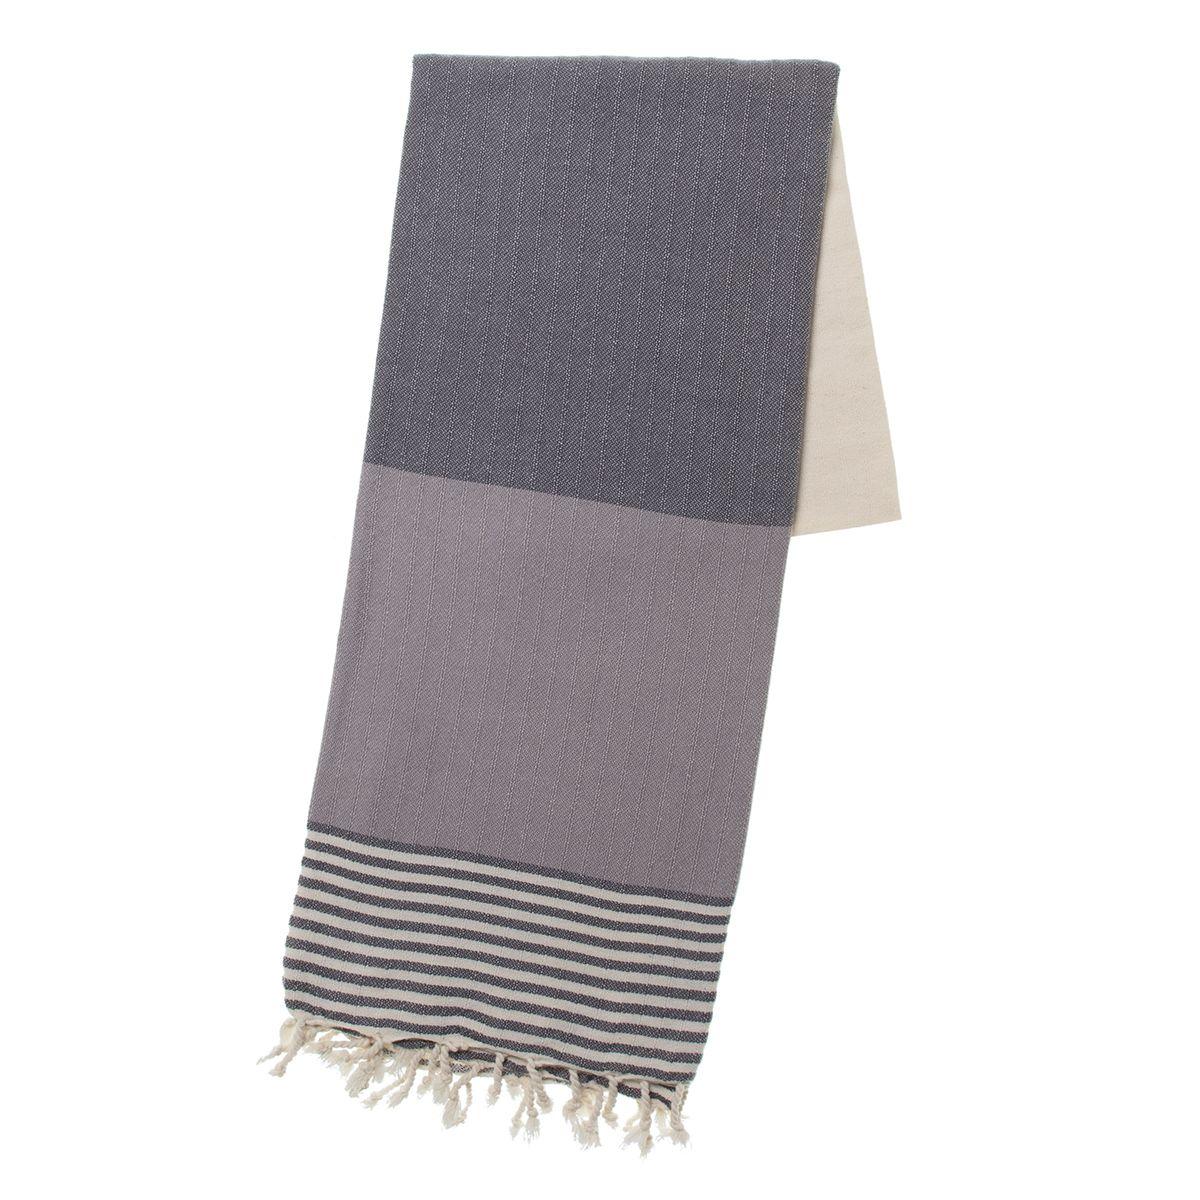 Peshtemal Twin Sultan - Dark Grey / Light Grey